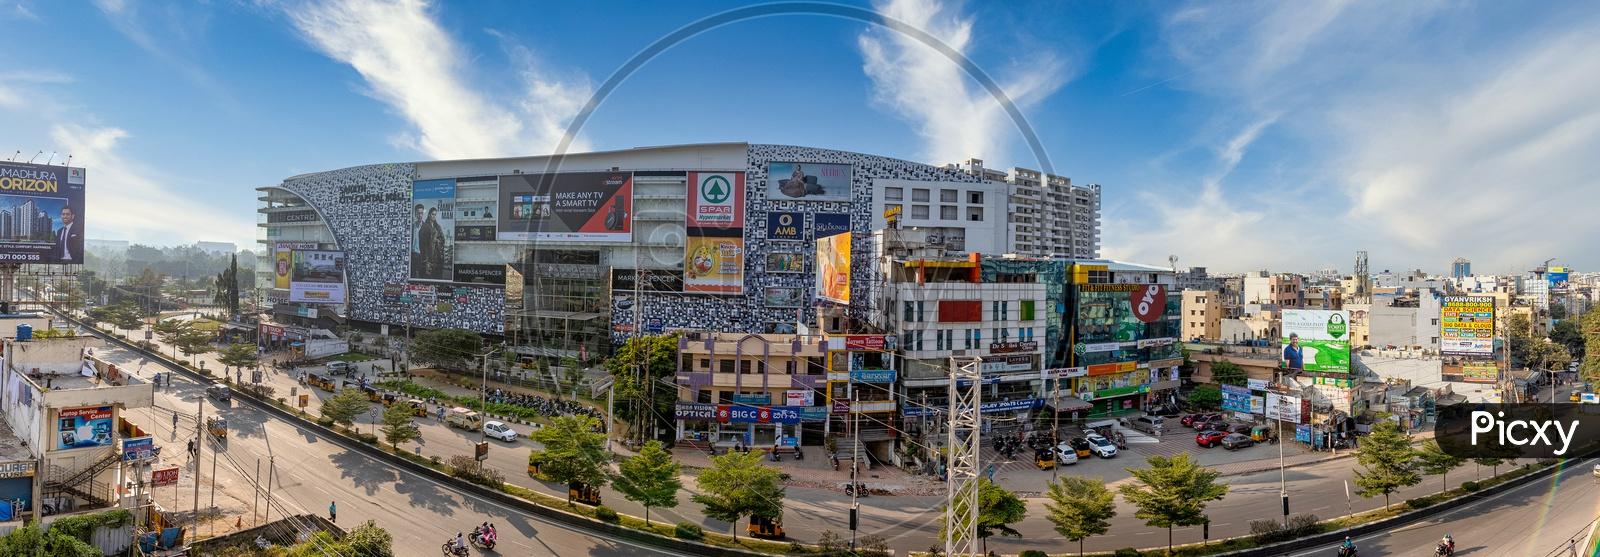 Panoramic view of Sarath City Capital mall